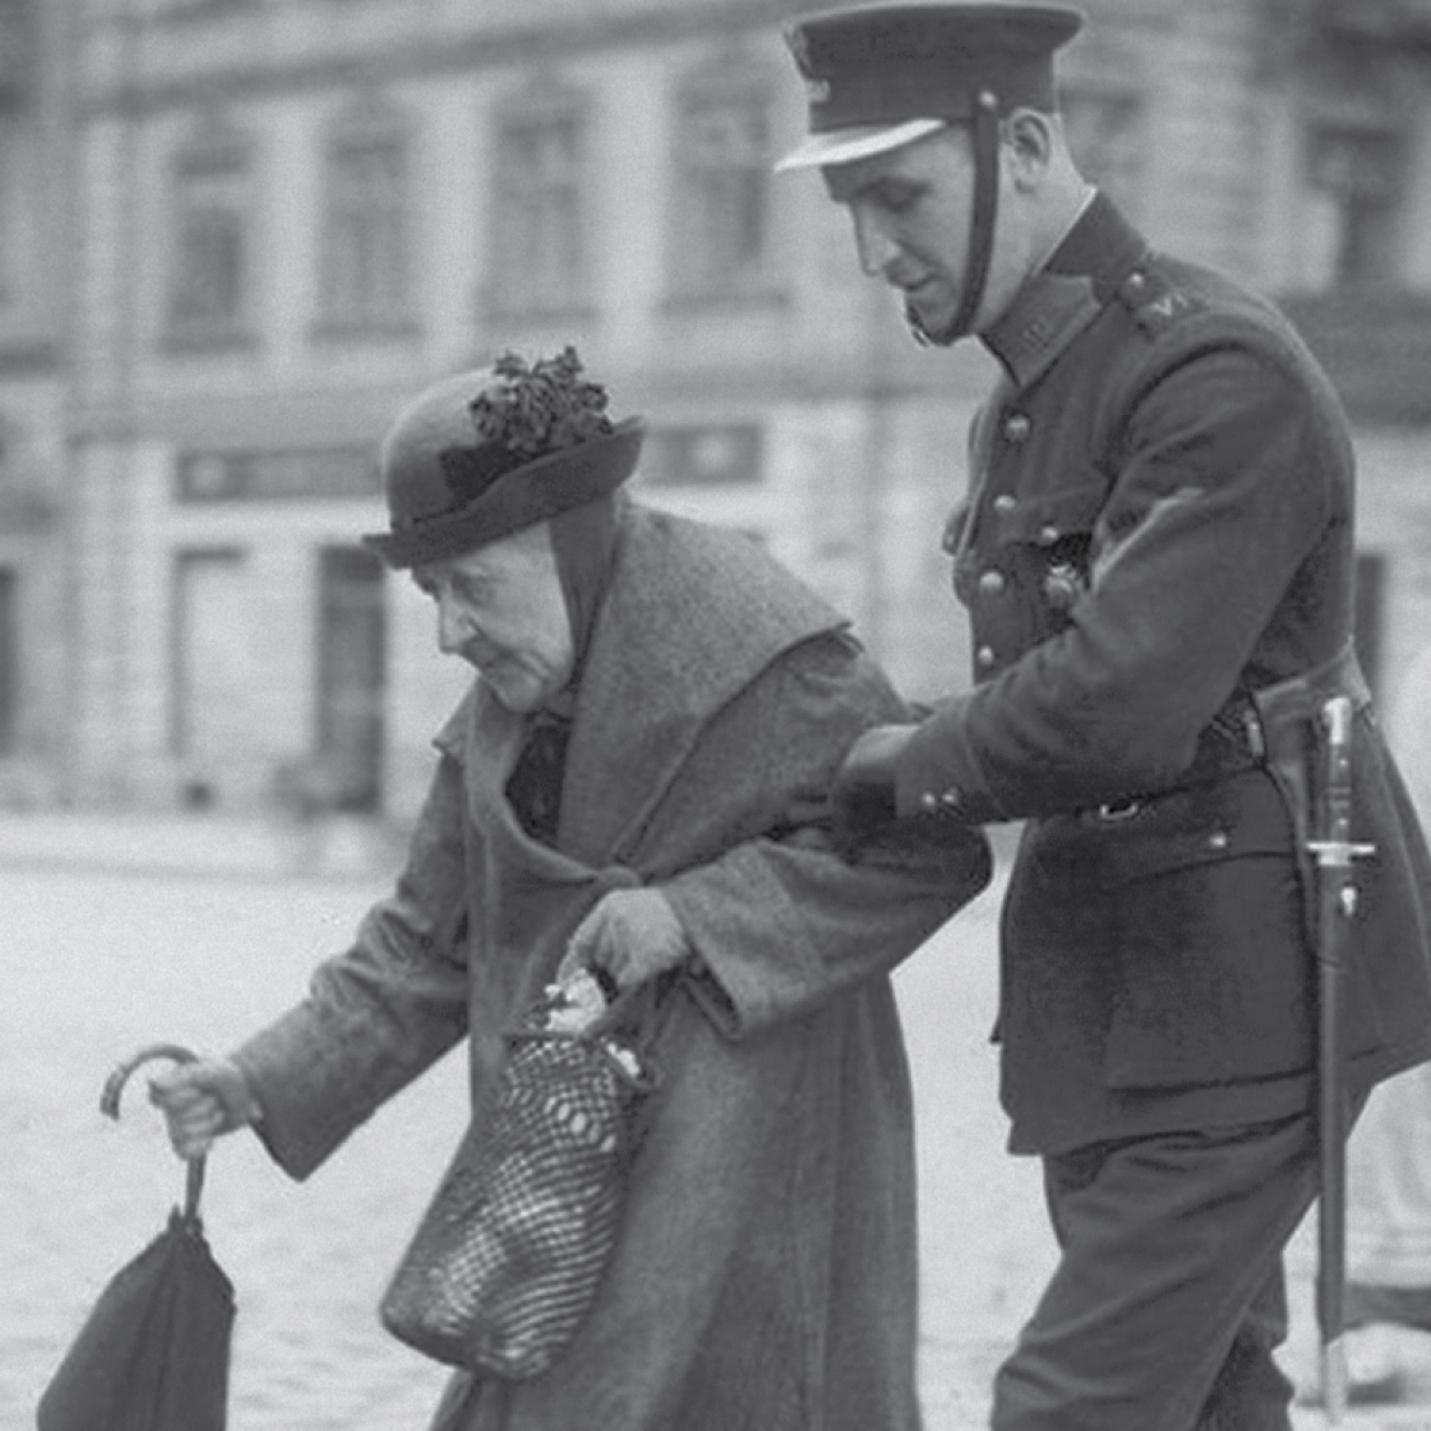 staruszka i policjant